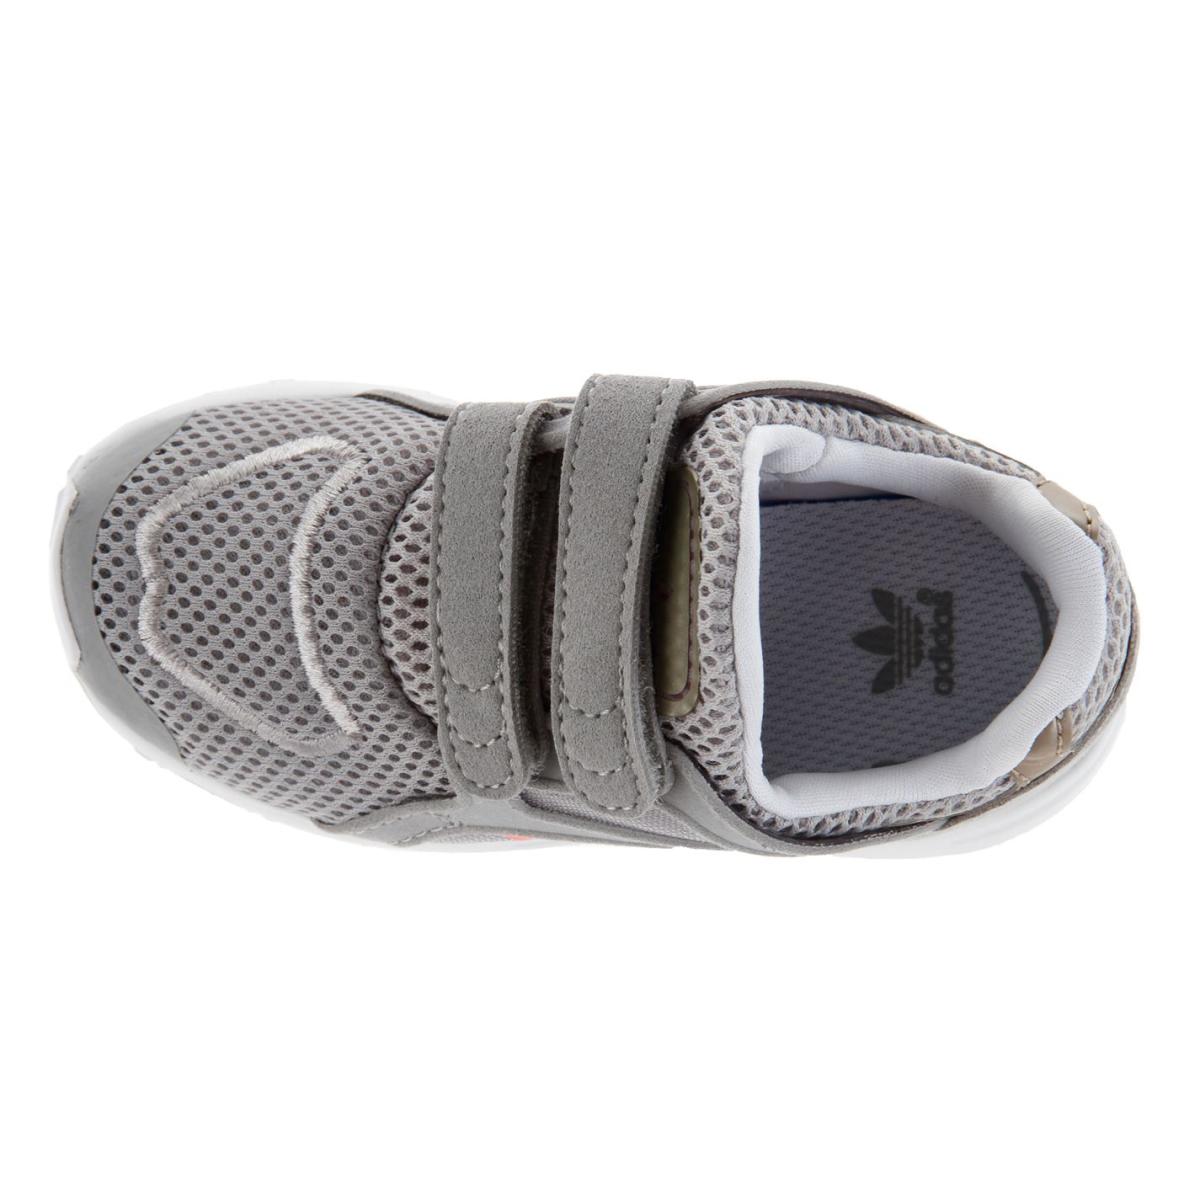 adidas Originals Kleinkinder Turnschuhe Racer Litecf Grau_FlashRot